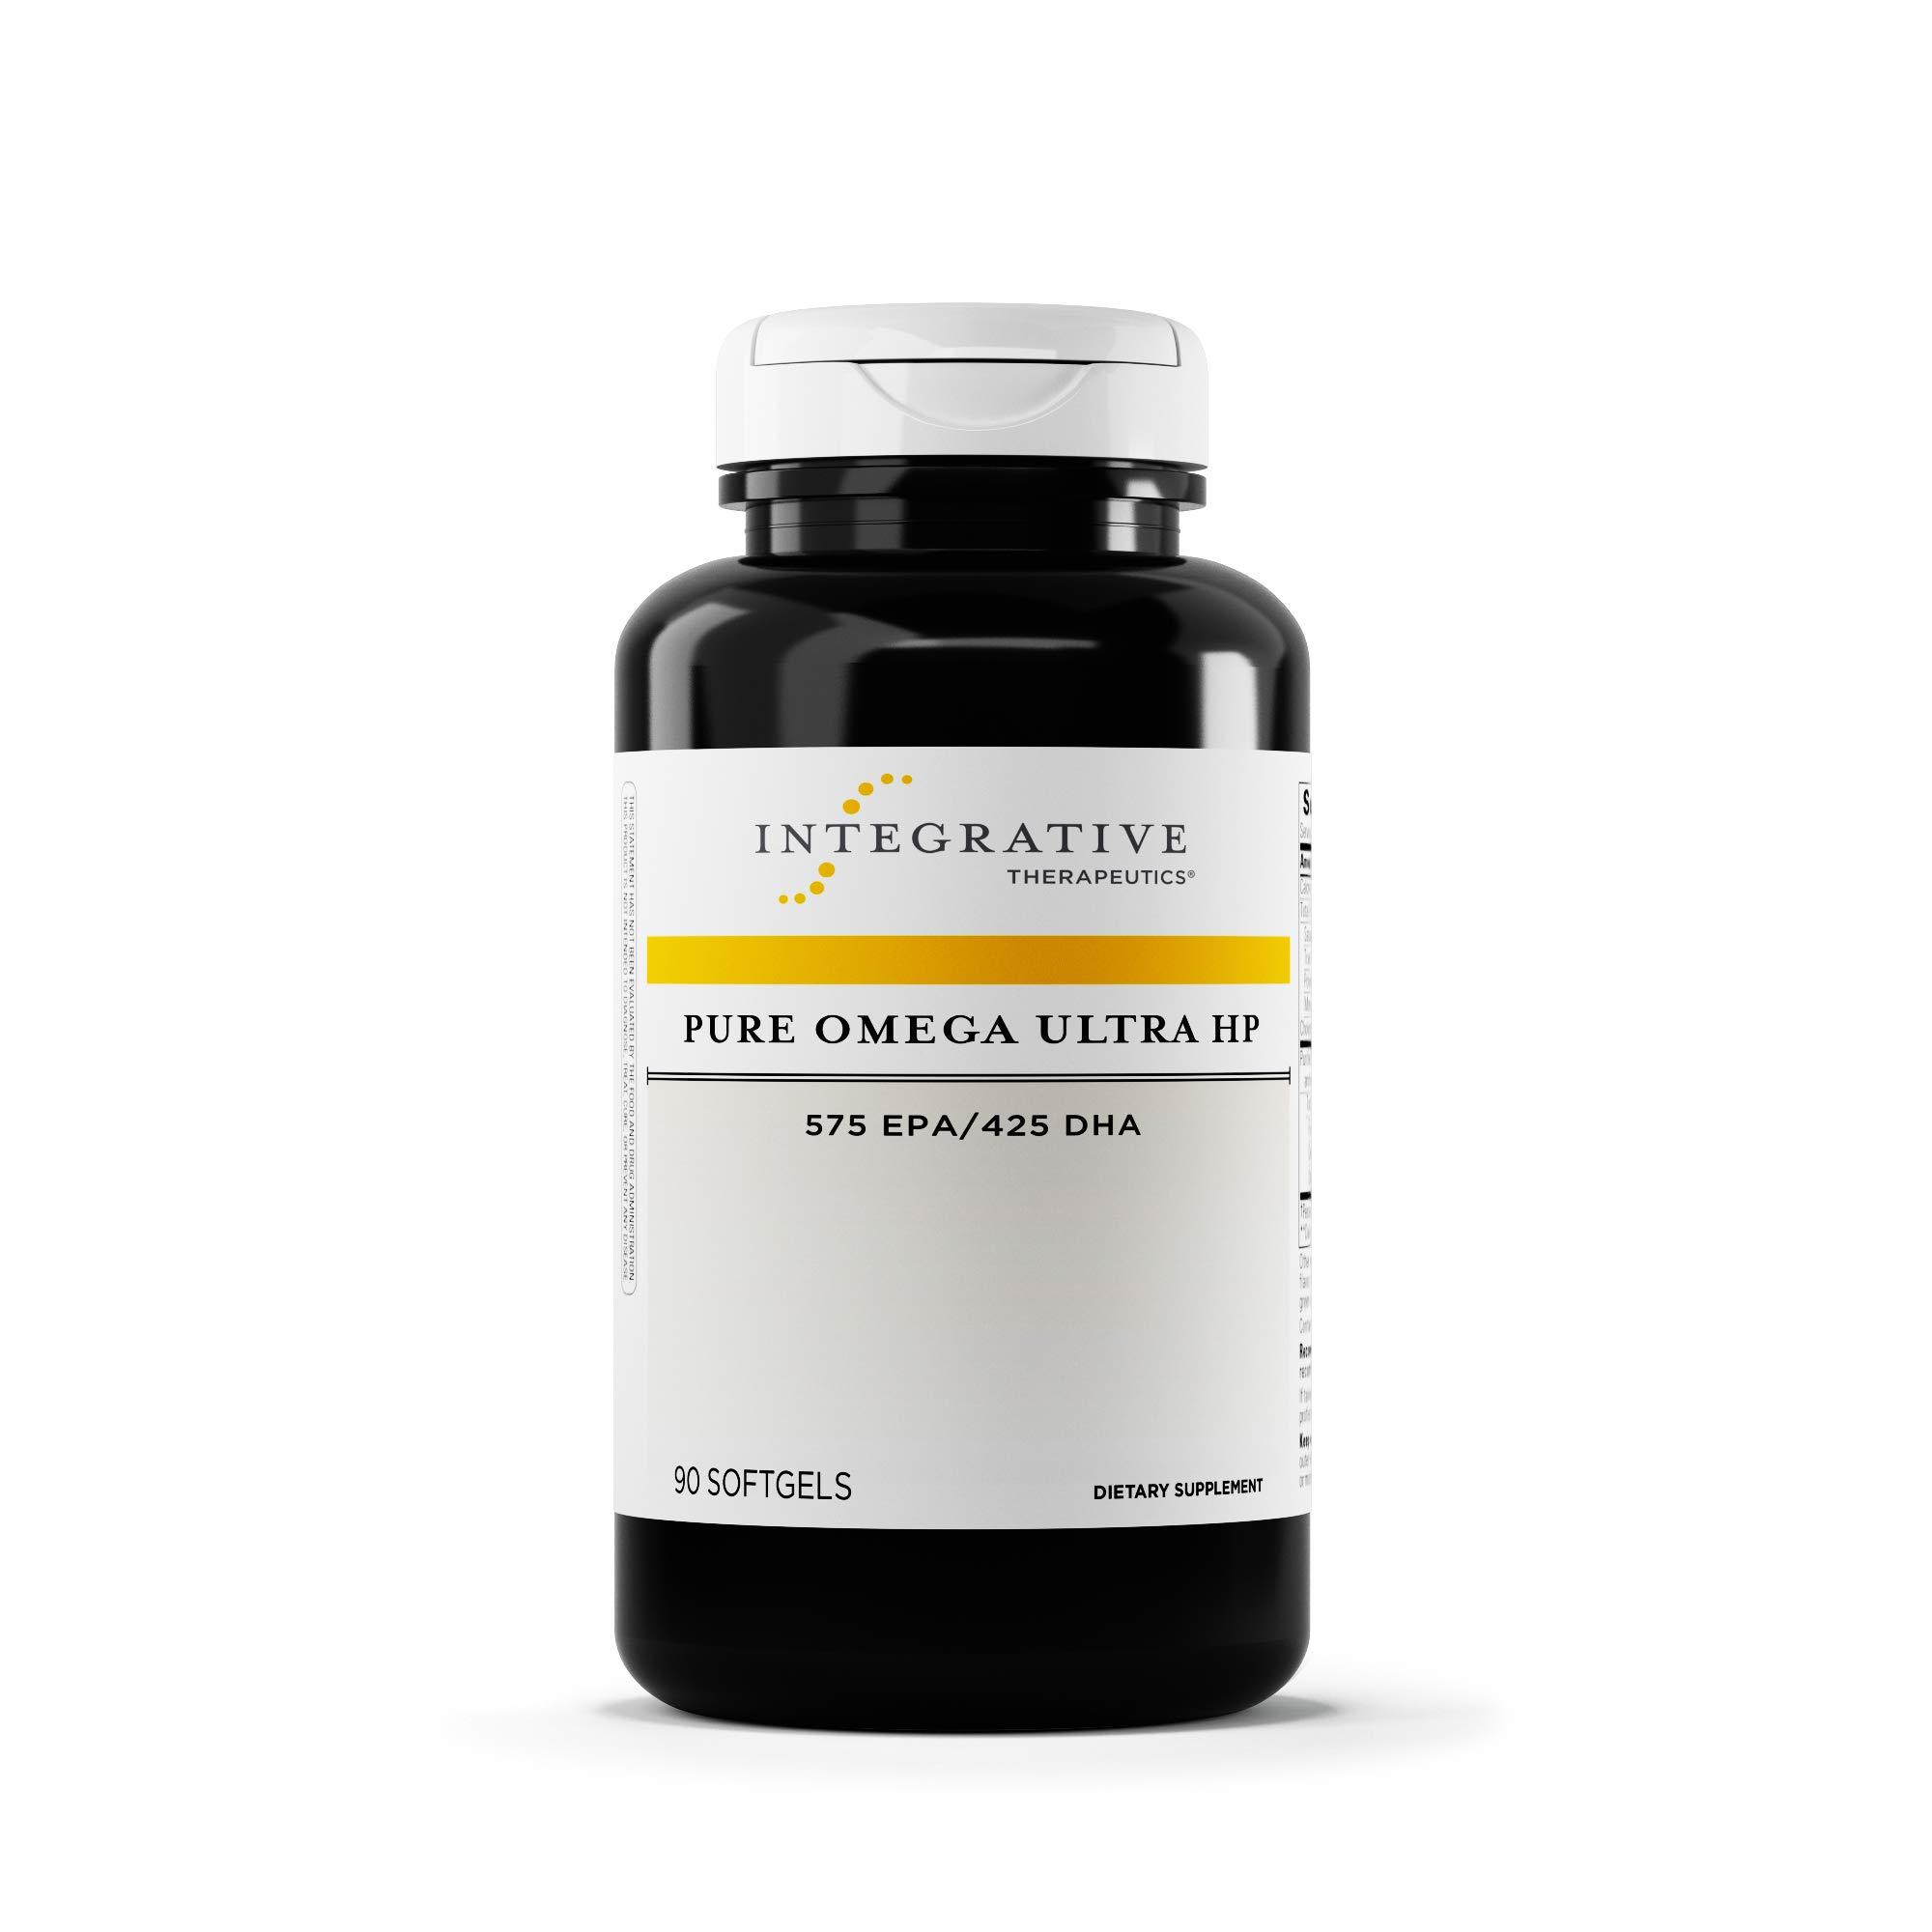 Integrative Therapeutics - Pure Omega Ultra HP Fish Oil Softgels - 1085 mg Omega 3 Fatty Acids with EPA and DHA - Wild Fish Oil - No Fishy Burp Back - Sustainably Sourced - 90 Count by Integrative Therapeutics (Image #1)